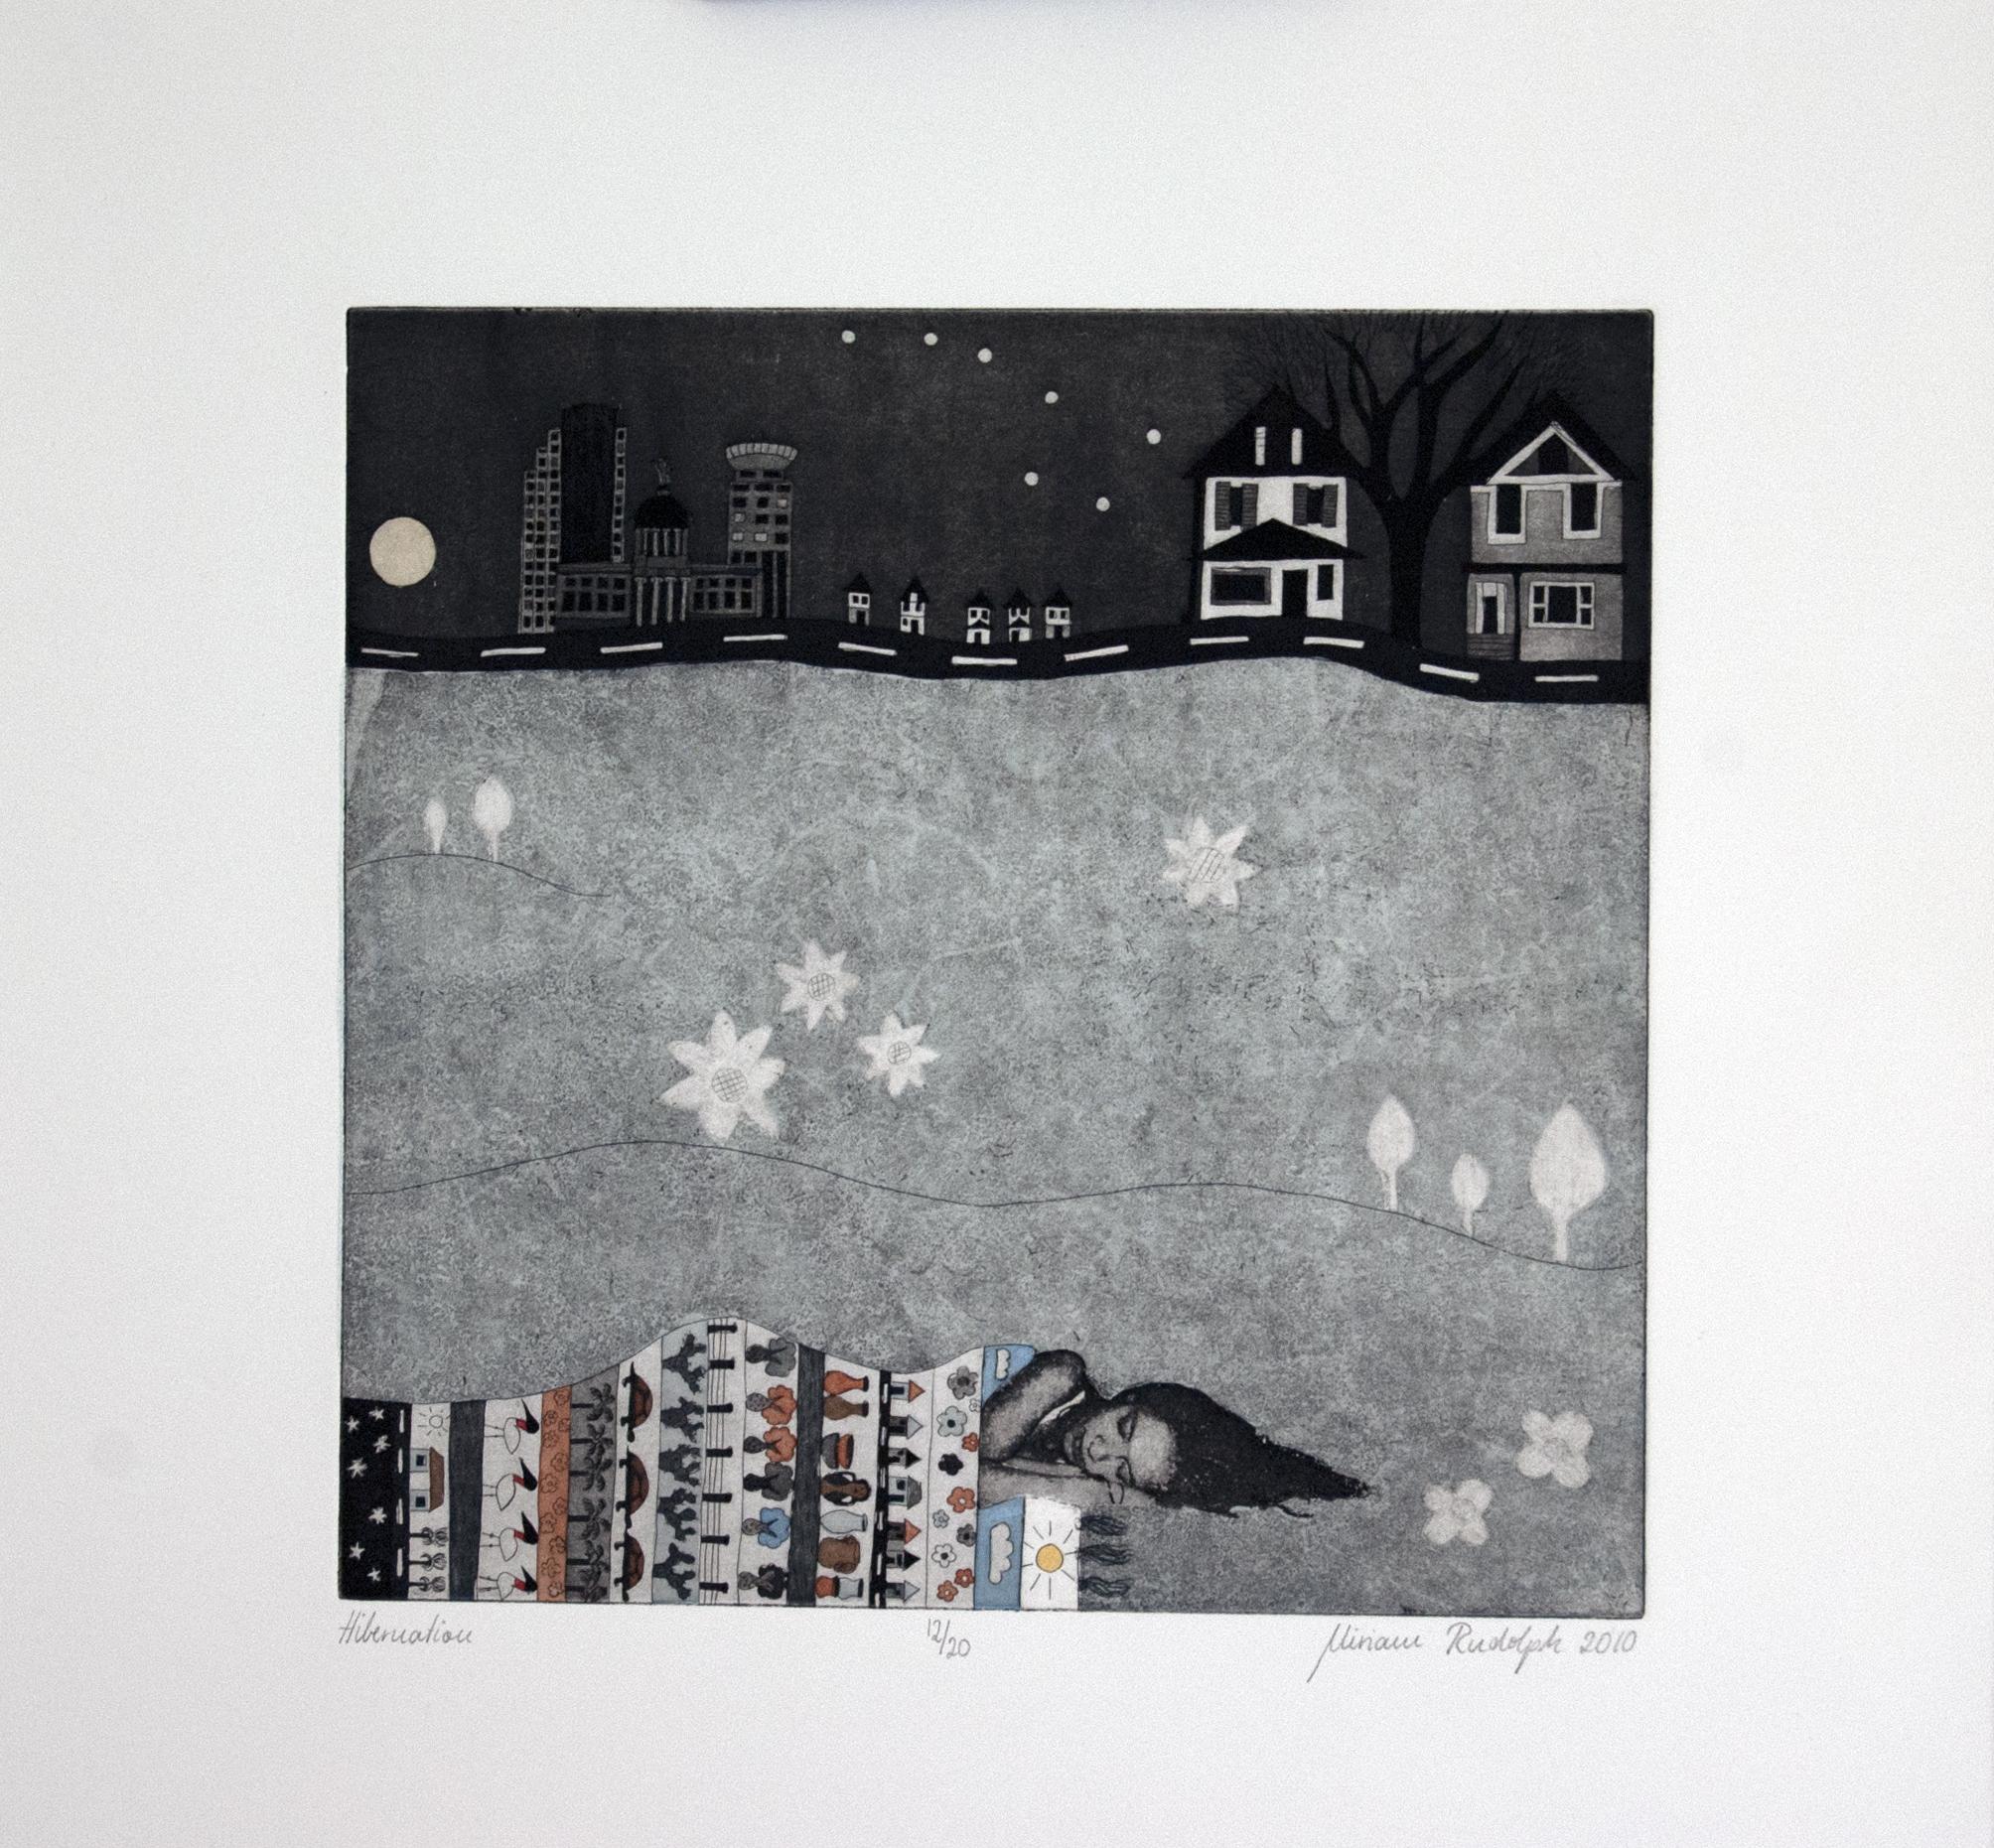 Hibernation, Etching screenprint hand colored printed on pescia magnani paper, 30 x 30cm